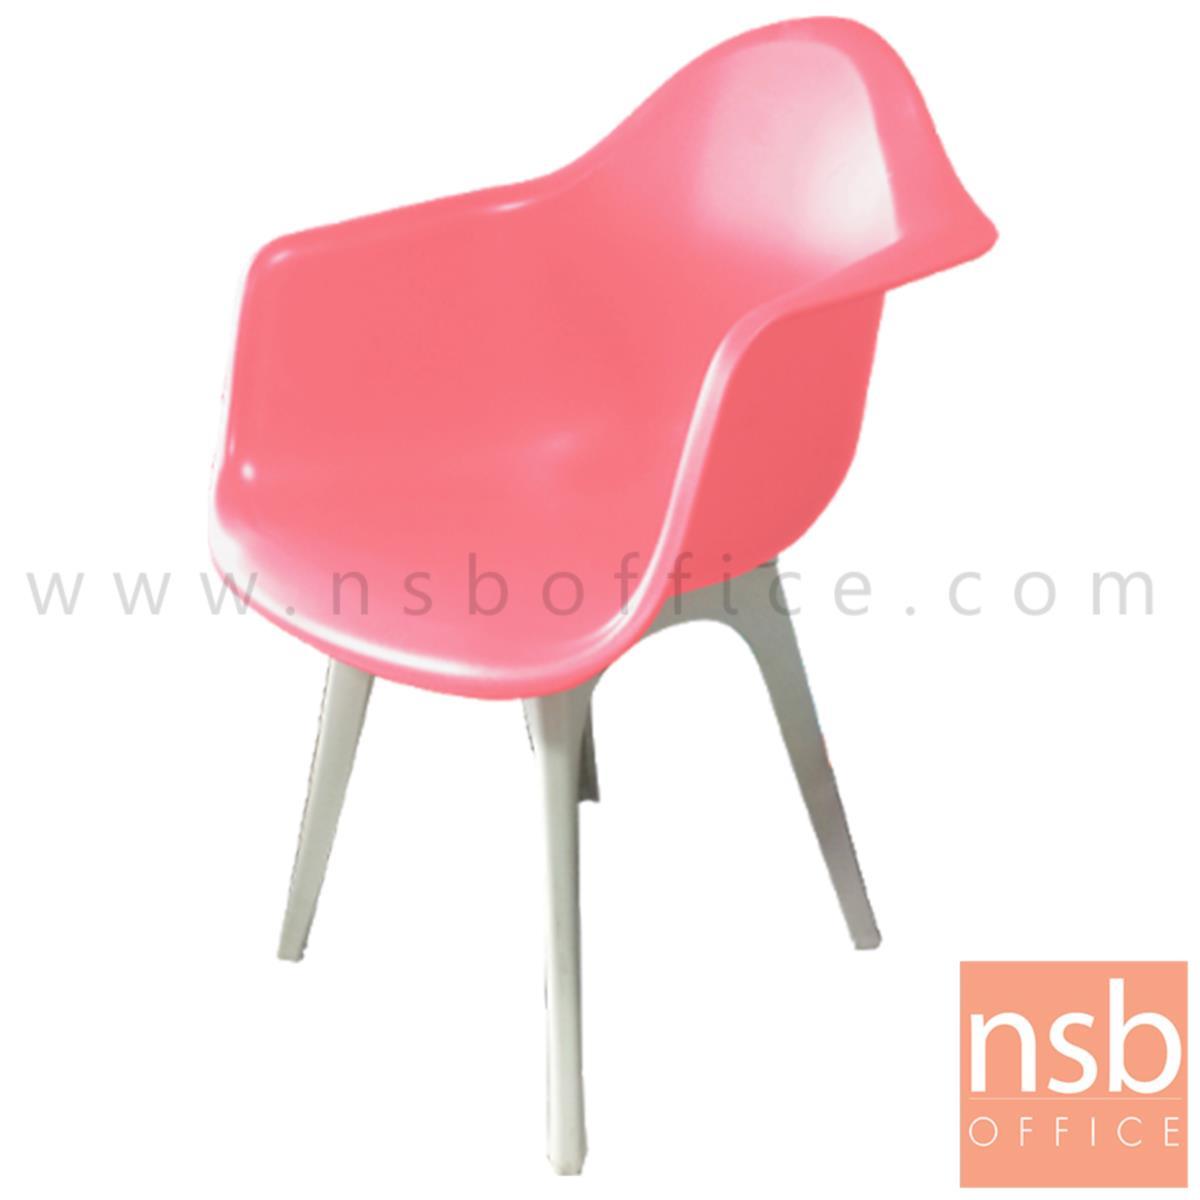 B29A279:เก้าอี้โมเดิร์นพลาสติกสีสัน รุ่น Ruffina (รูฟิน่า) ขนาด 62.5W cm.